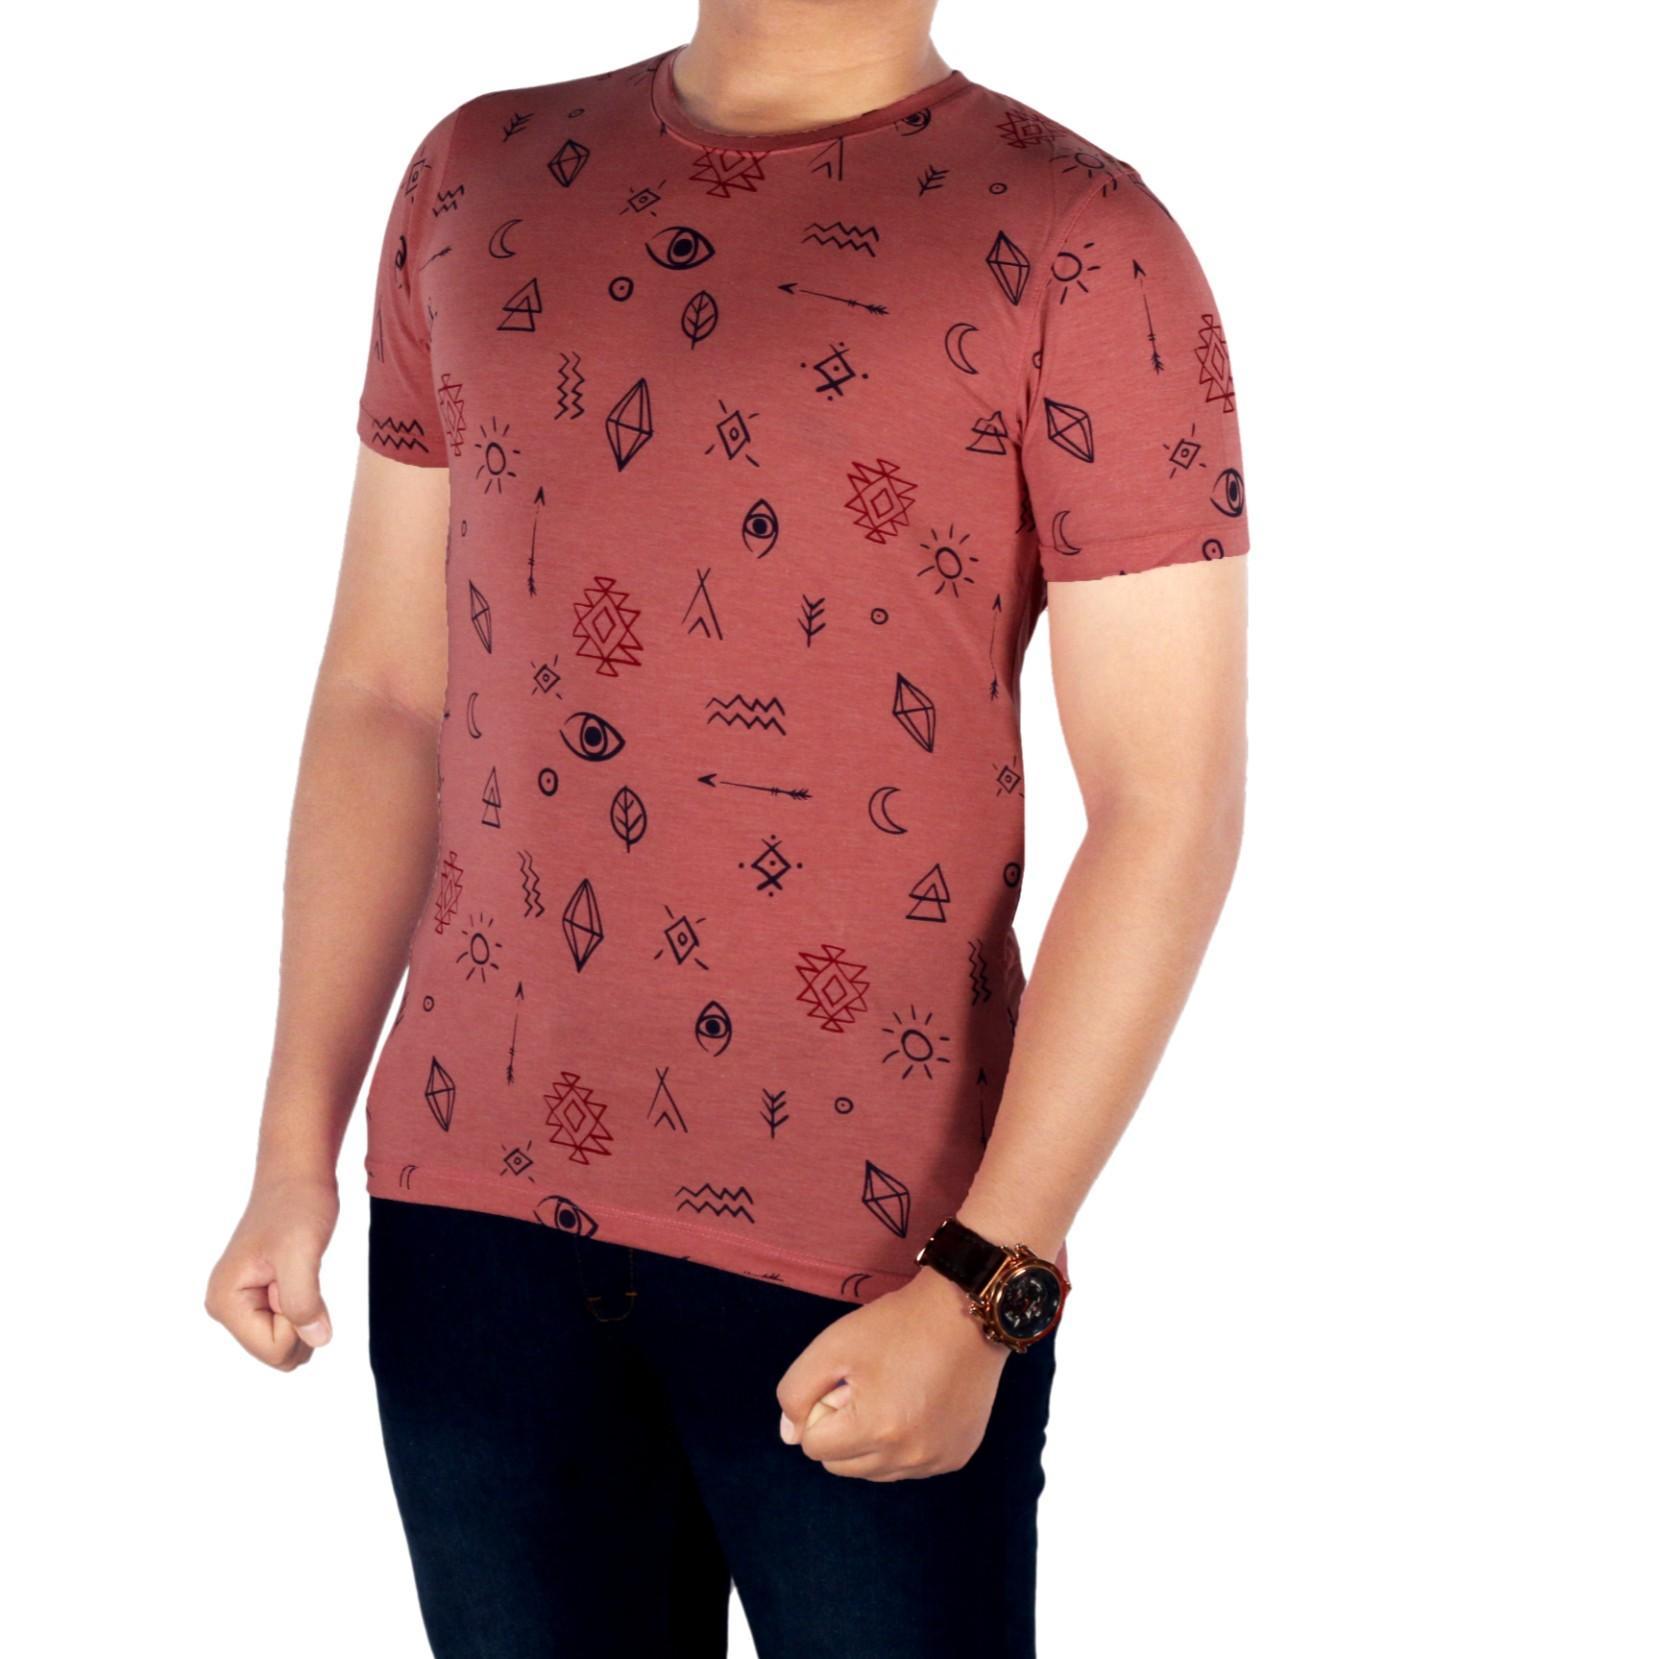 Dgm_Fashion1 Kaos Distro Lengan Pendek/Baseball Kaos/baju kaos polos pria/ Kaos Baseball Hitam/Jers